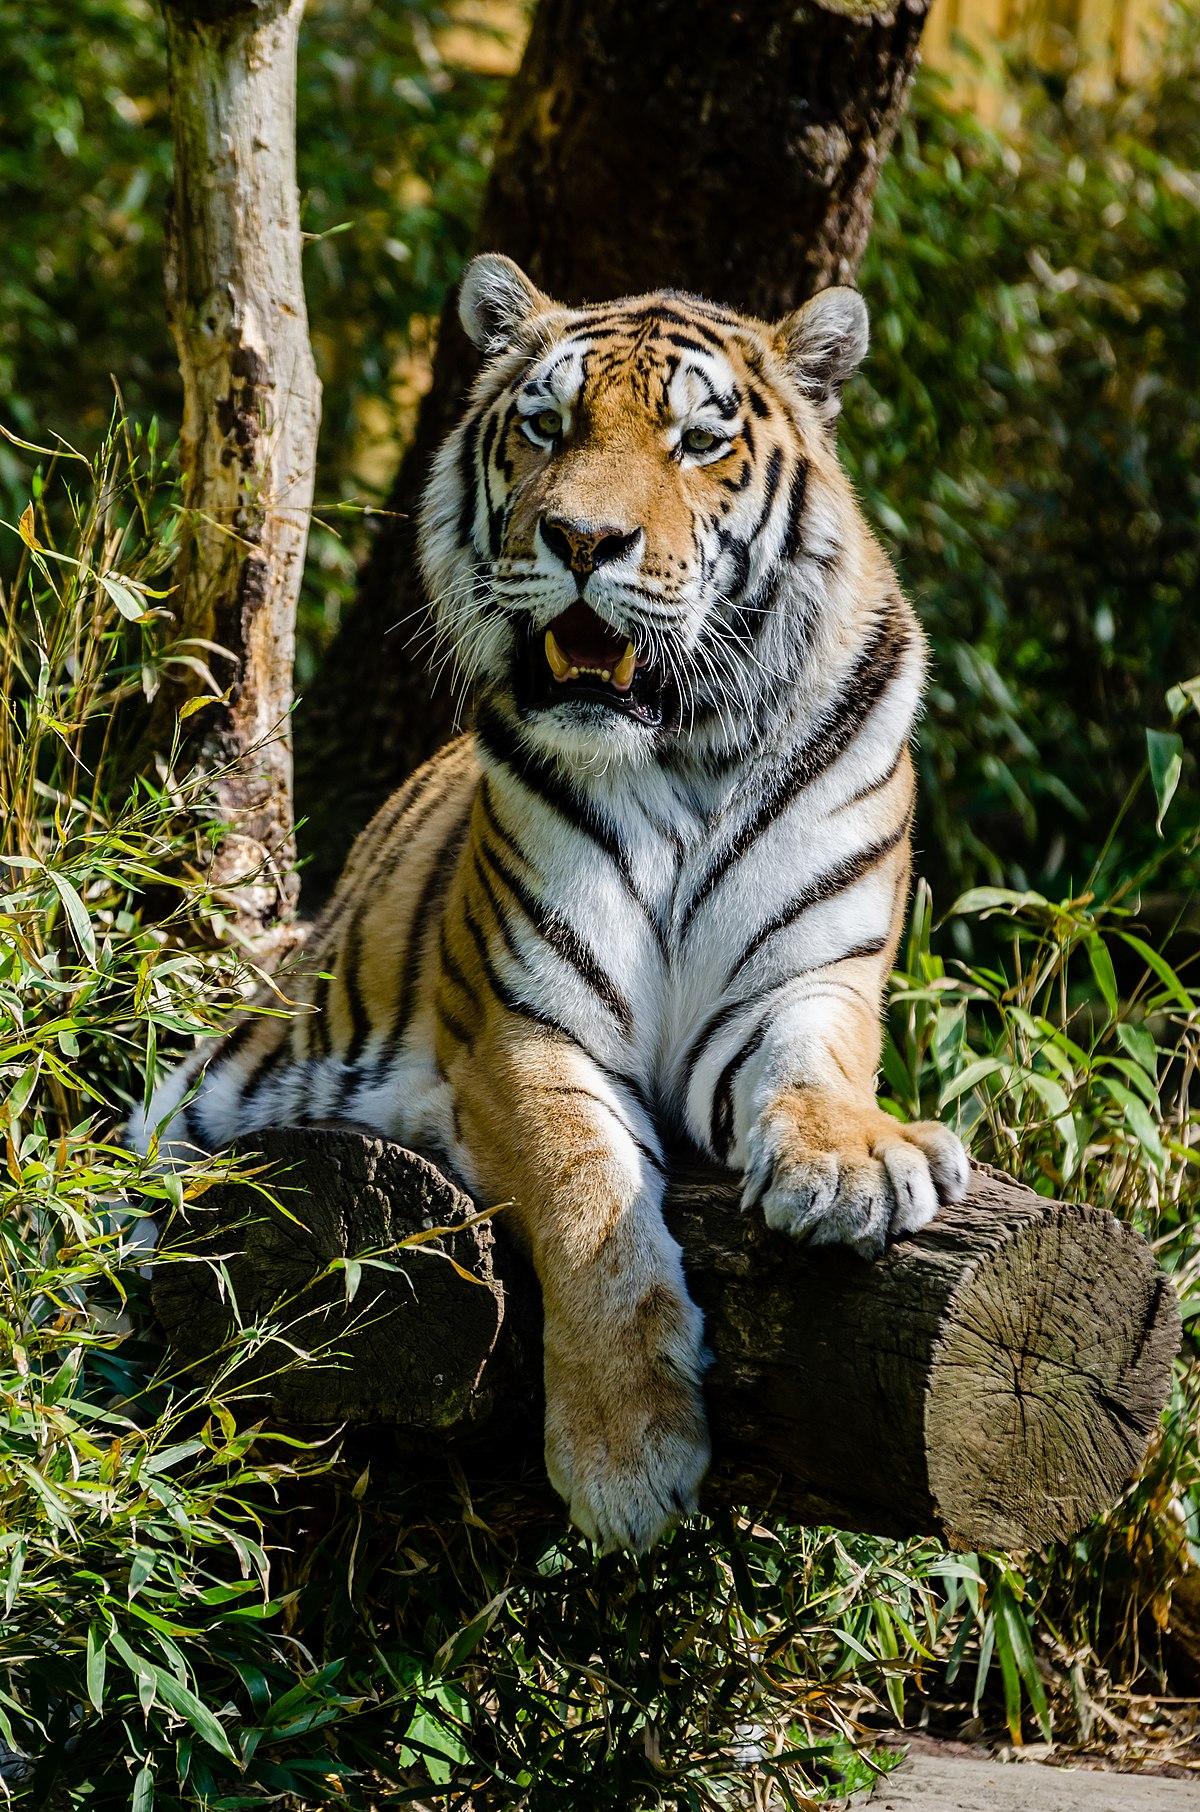 tiger rasputin